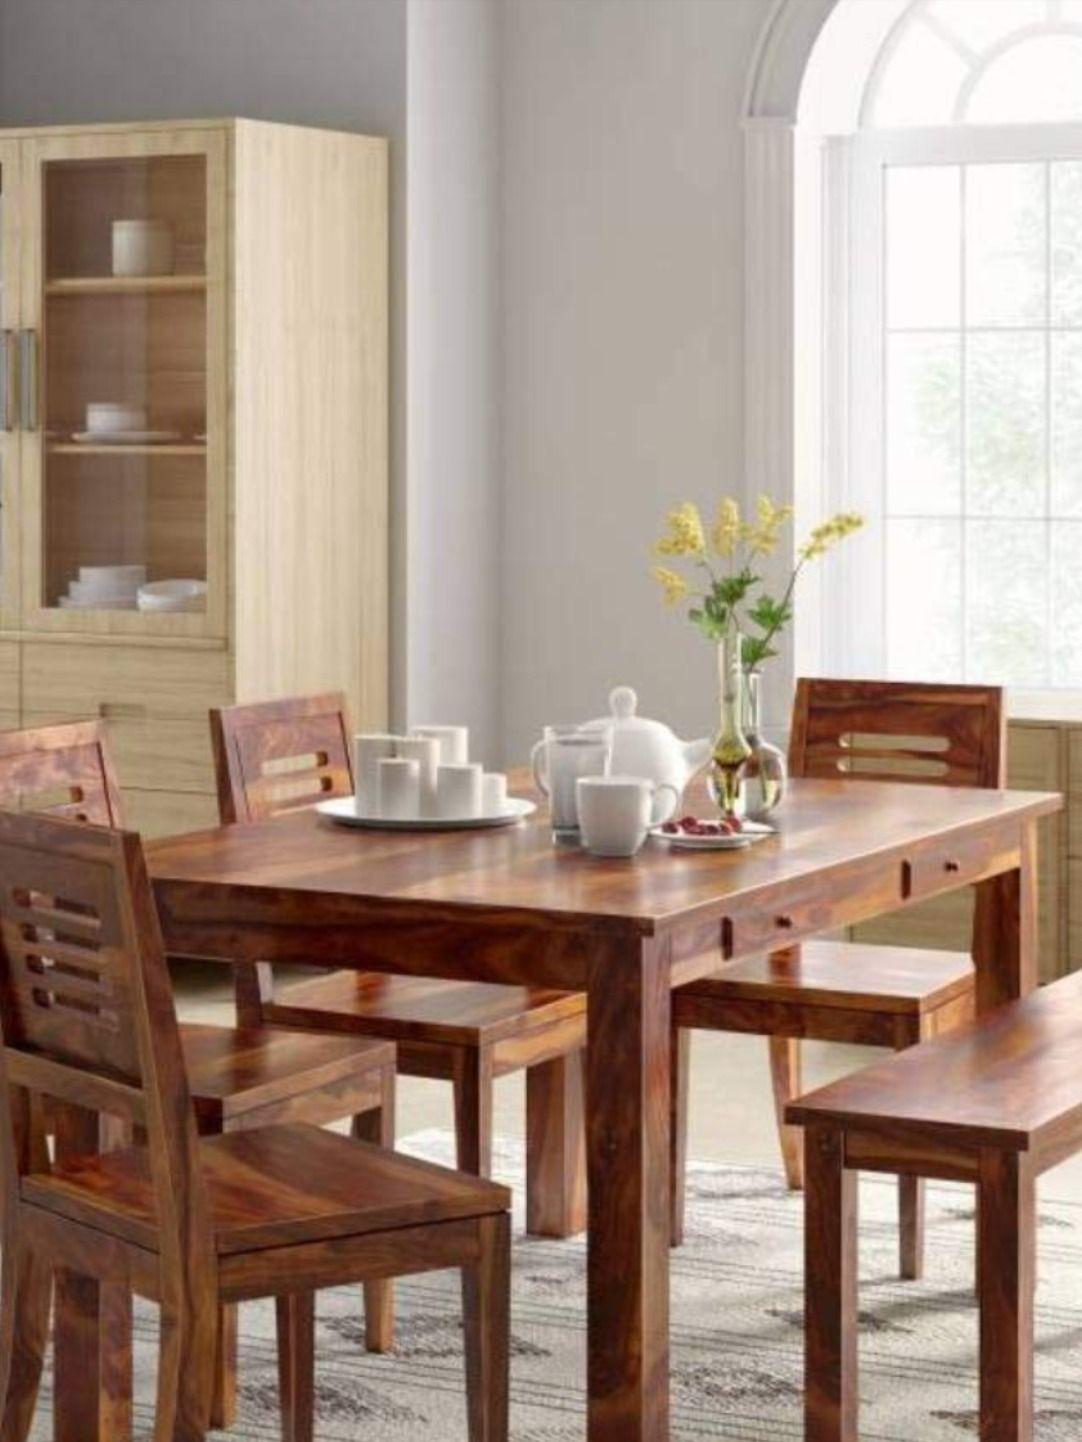 Shop Now  #HomeDecor #HomeDecorLo #HomeStore #DiningTable #ForHome